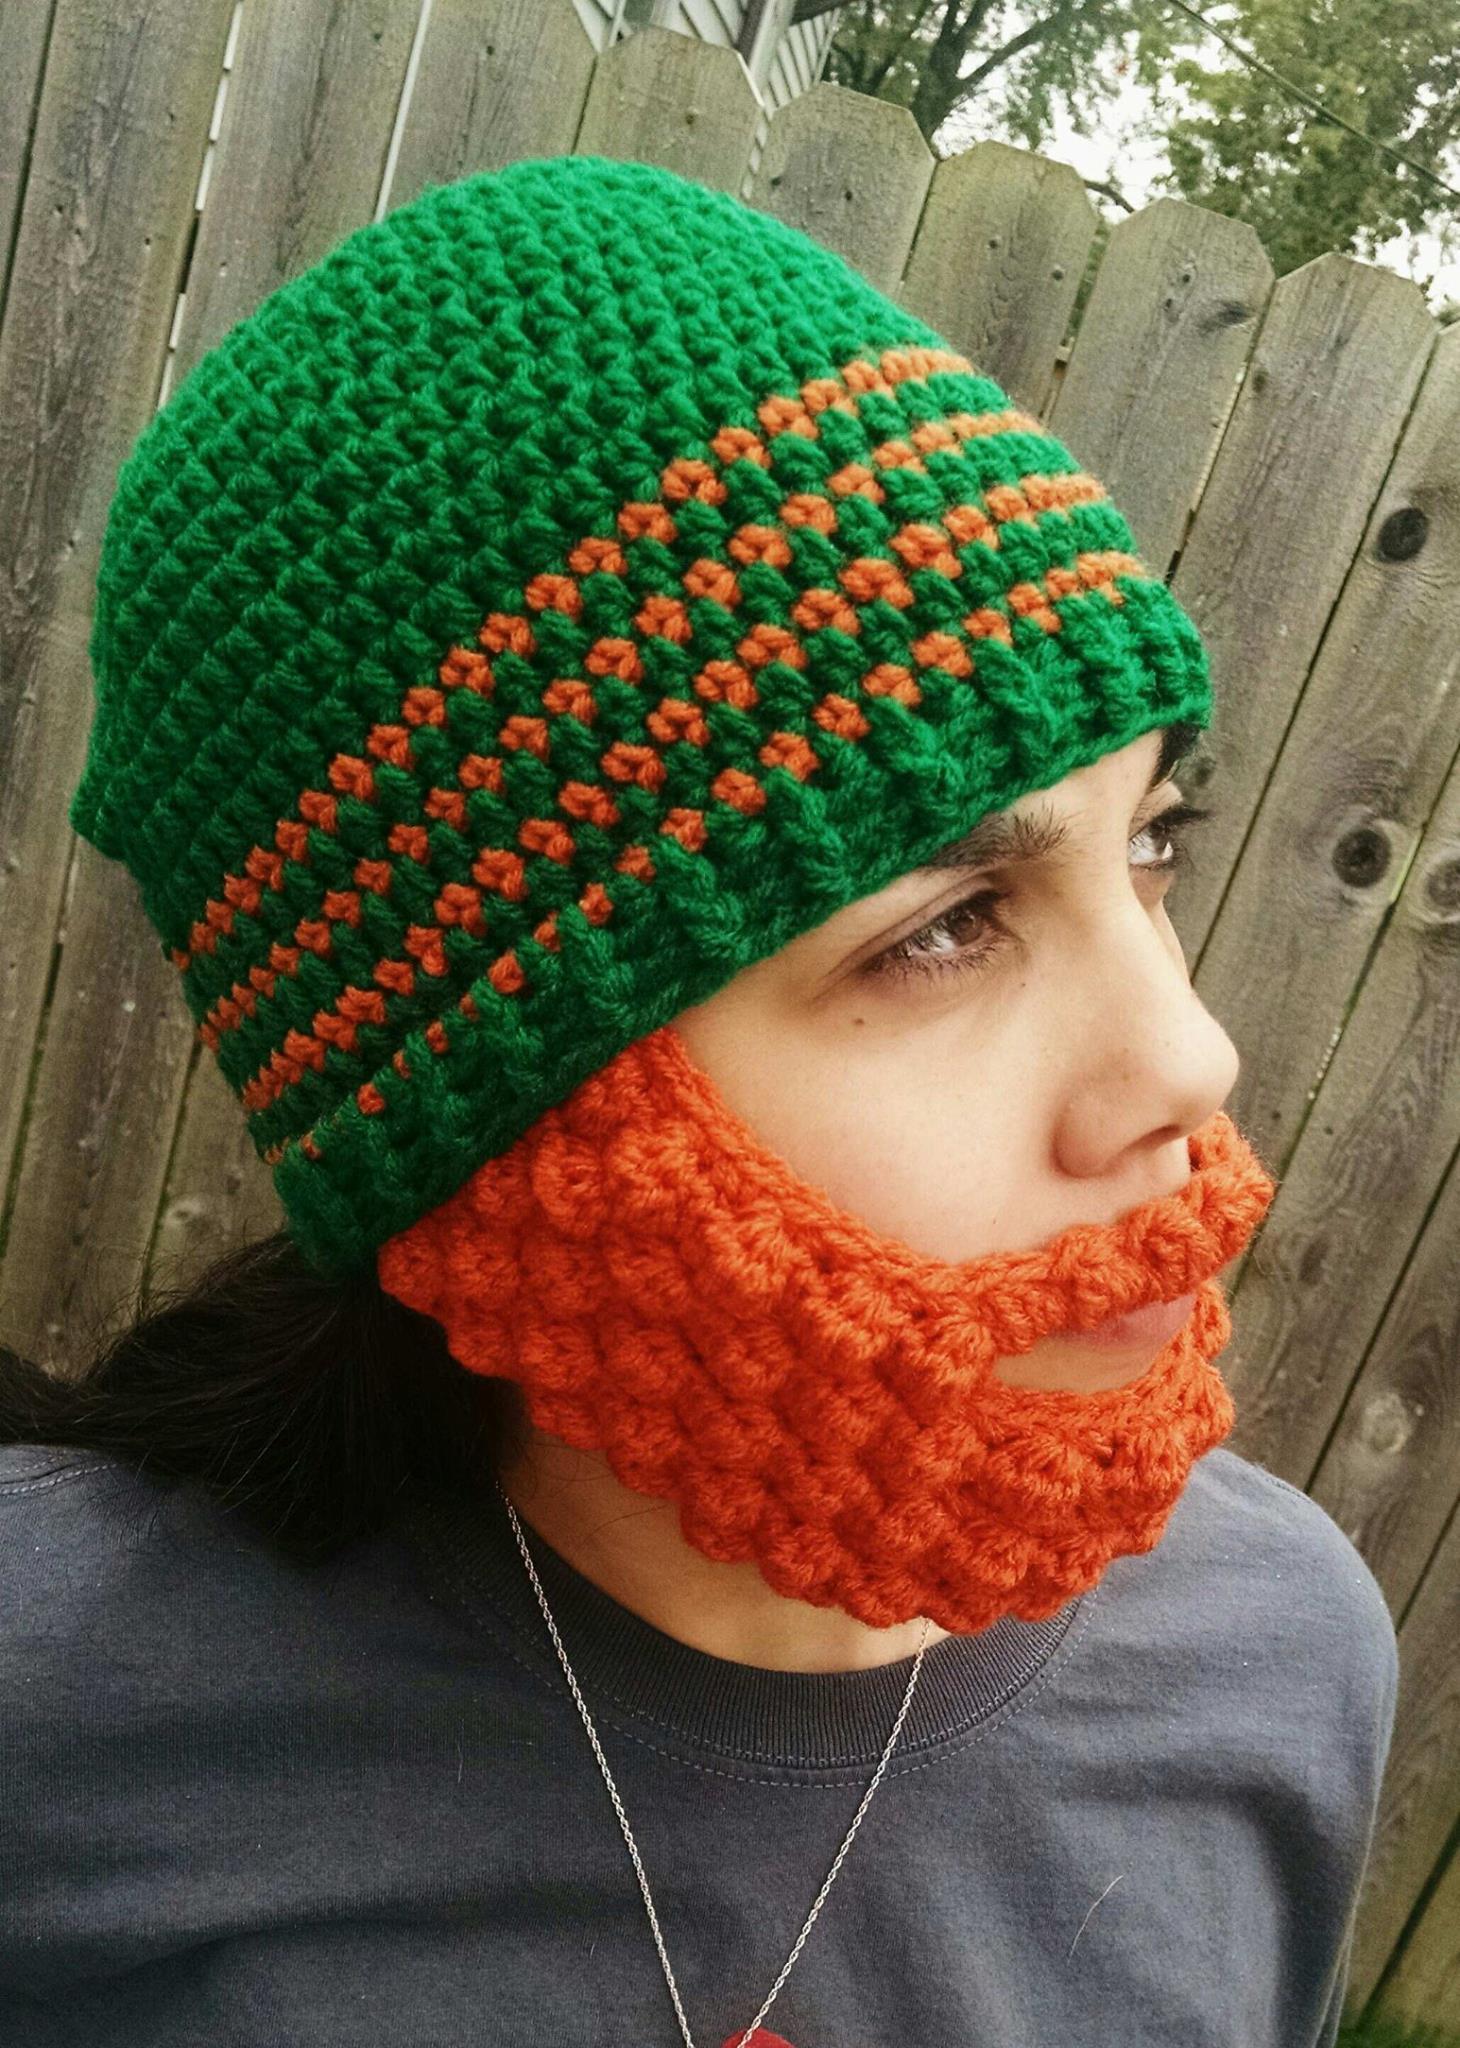 Crochet Tutorial: Puff Stitch Beard « YARNutopia by Nadia Fuad